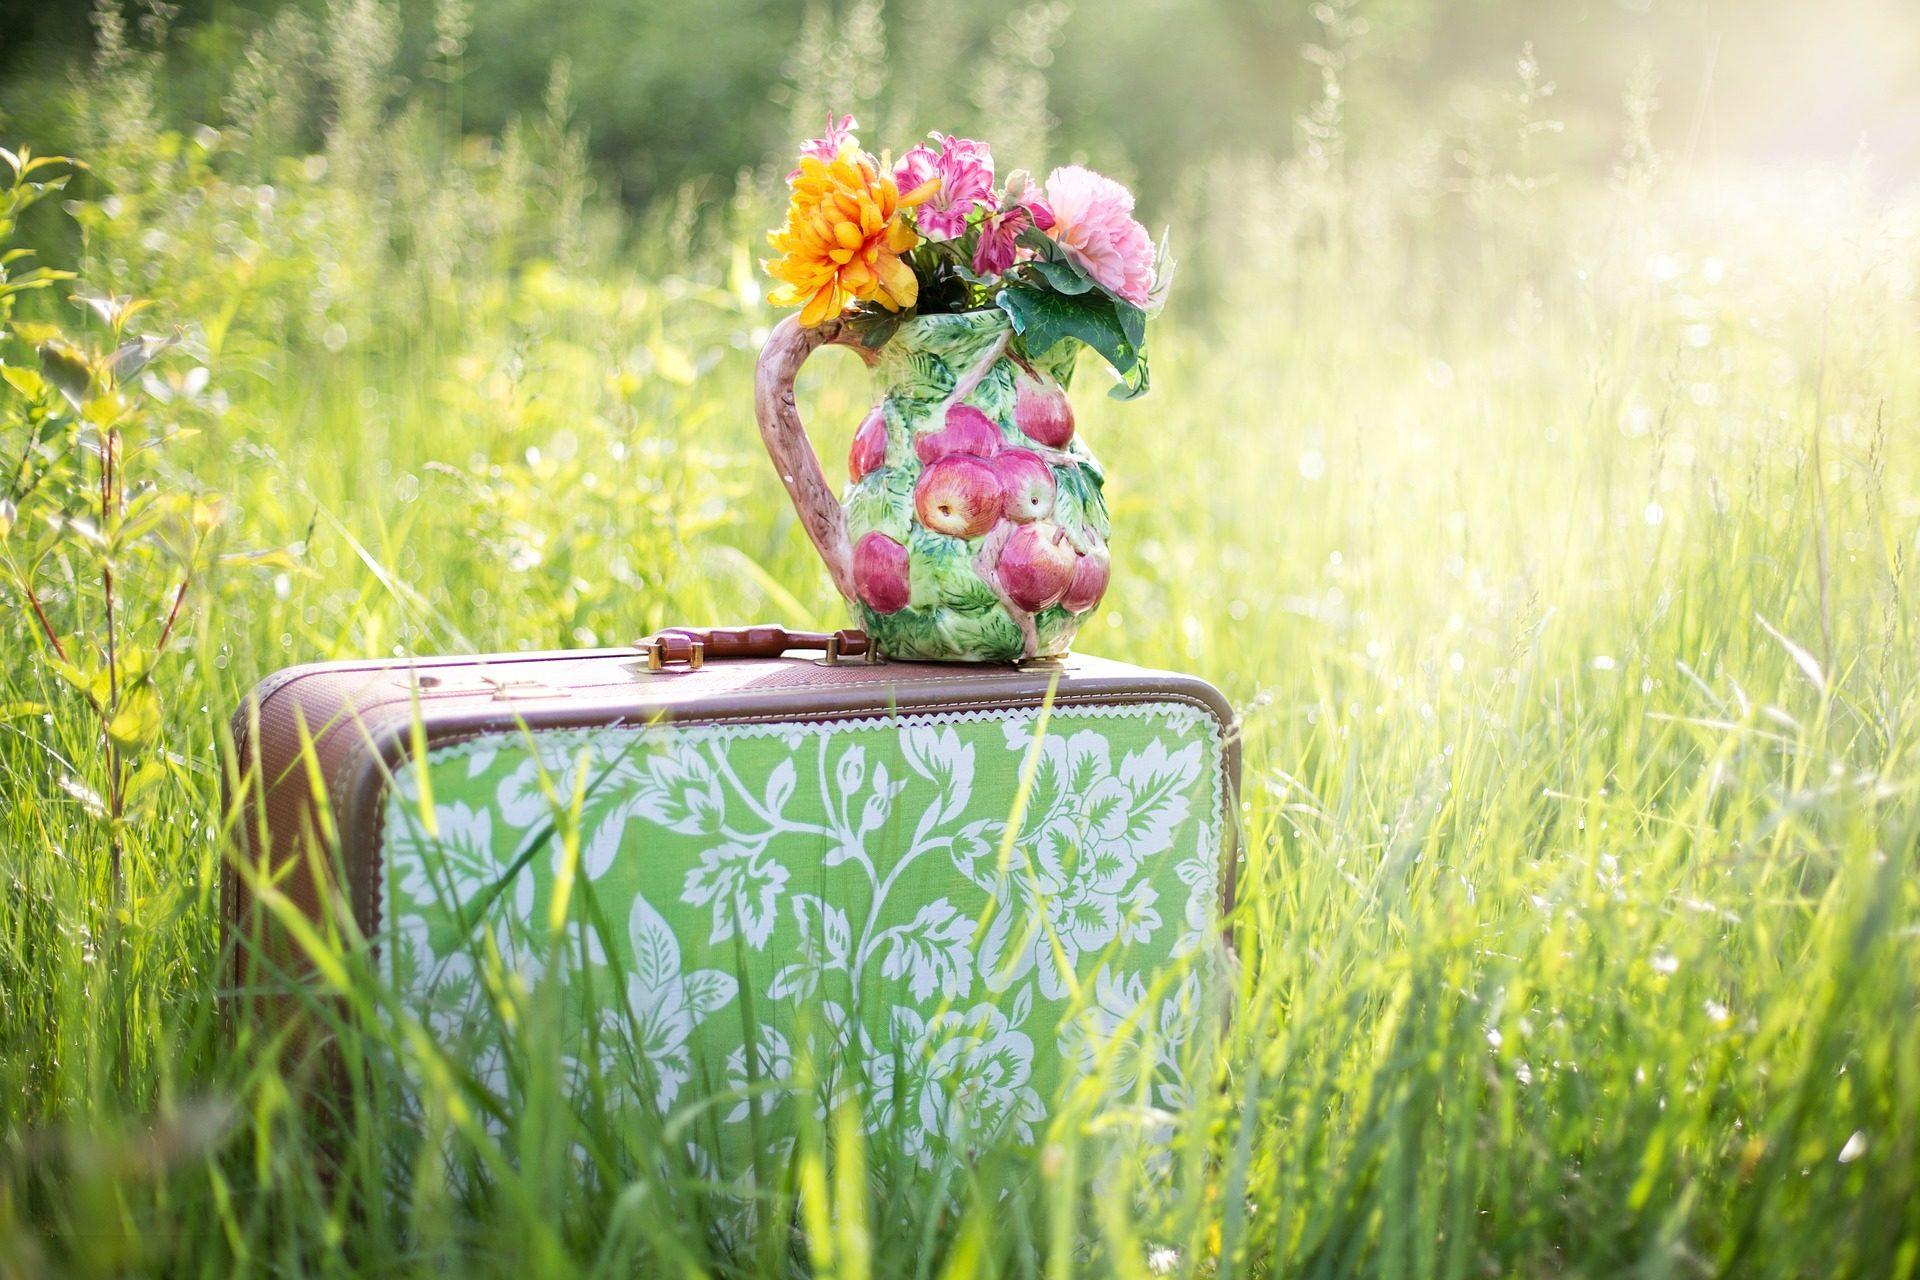 maleta, फूलदान, फूल, फ़ील्ड, घास - HD वॉलपेपर - प्रोफेसर-falken.com